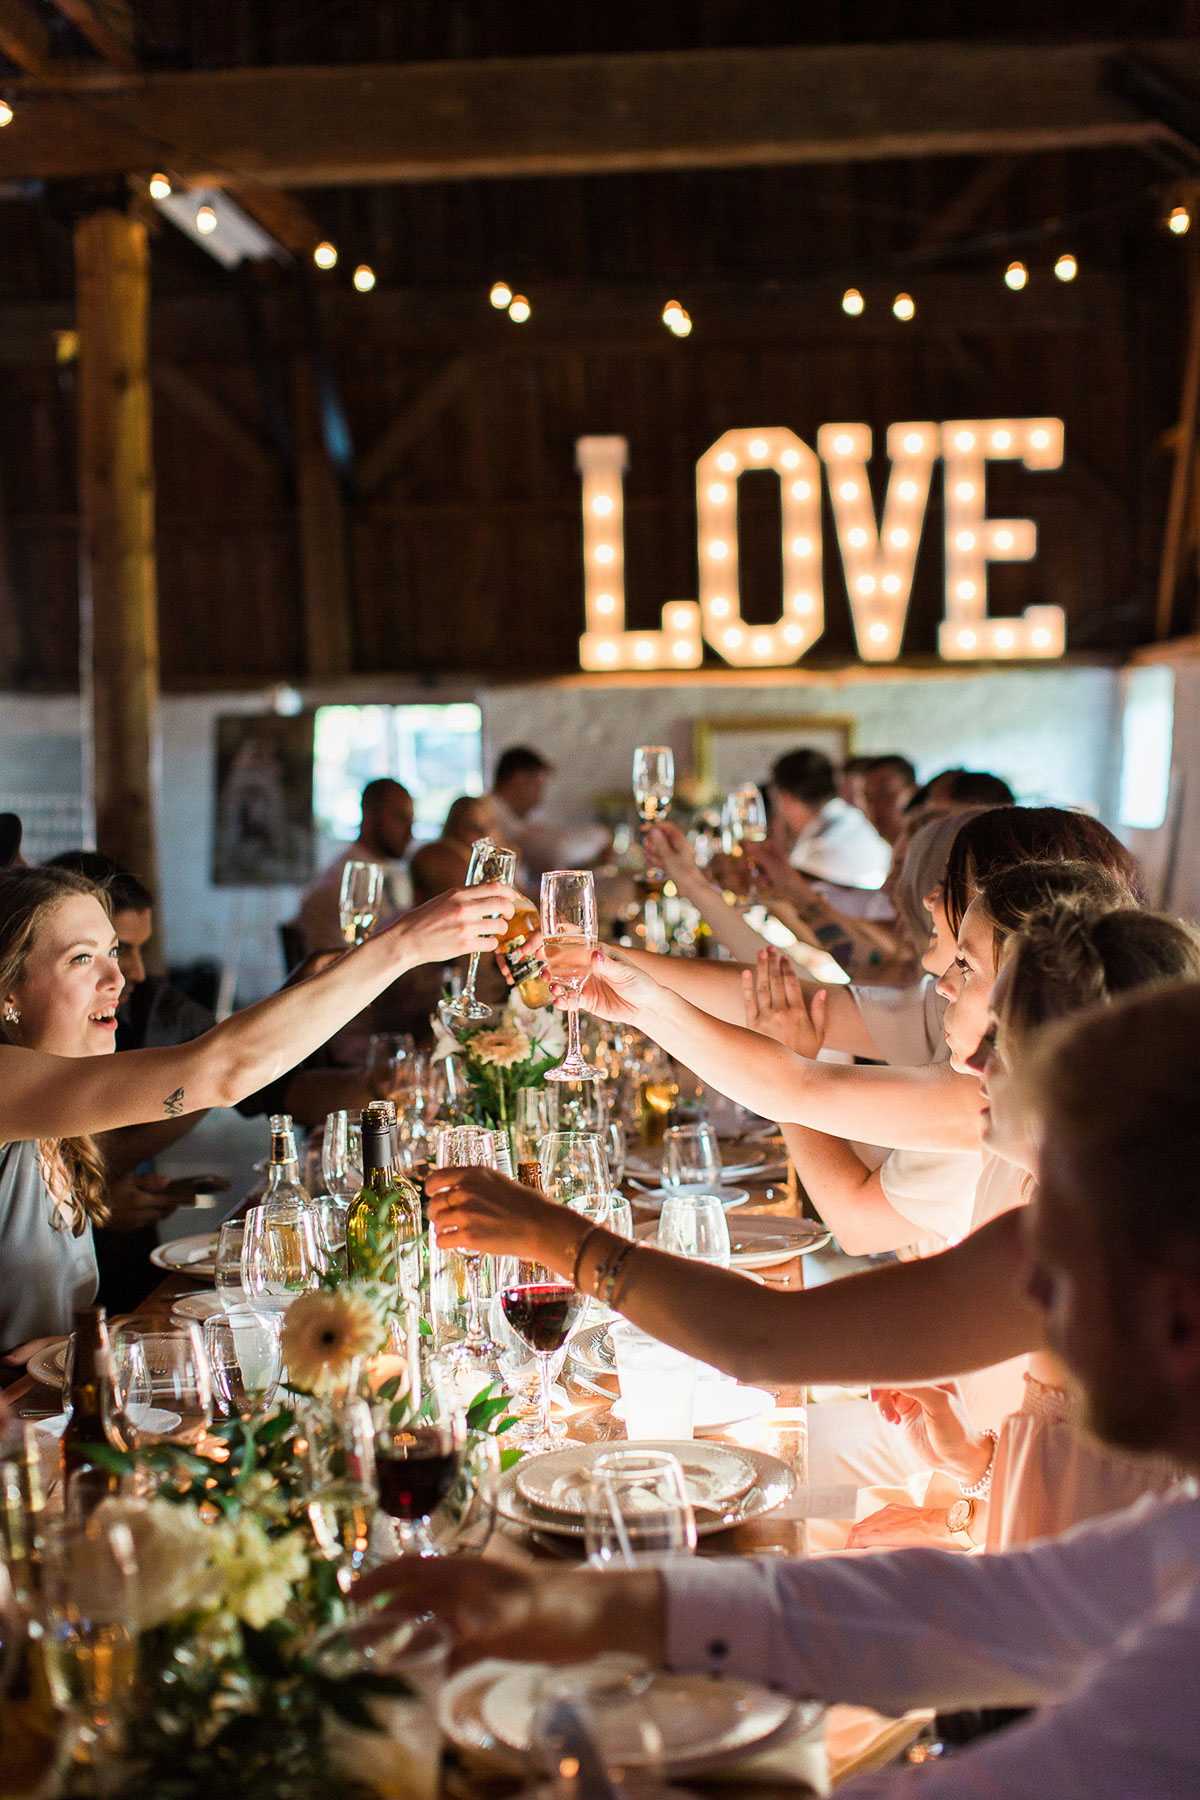 beatrice-elford-photography-vineyard-bride-swish-list-balls-falls-vineland-wedding-73.jpg